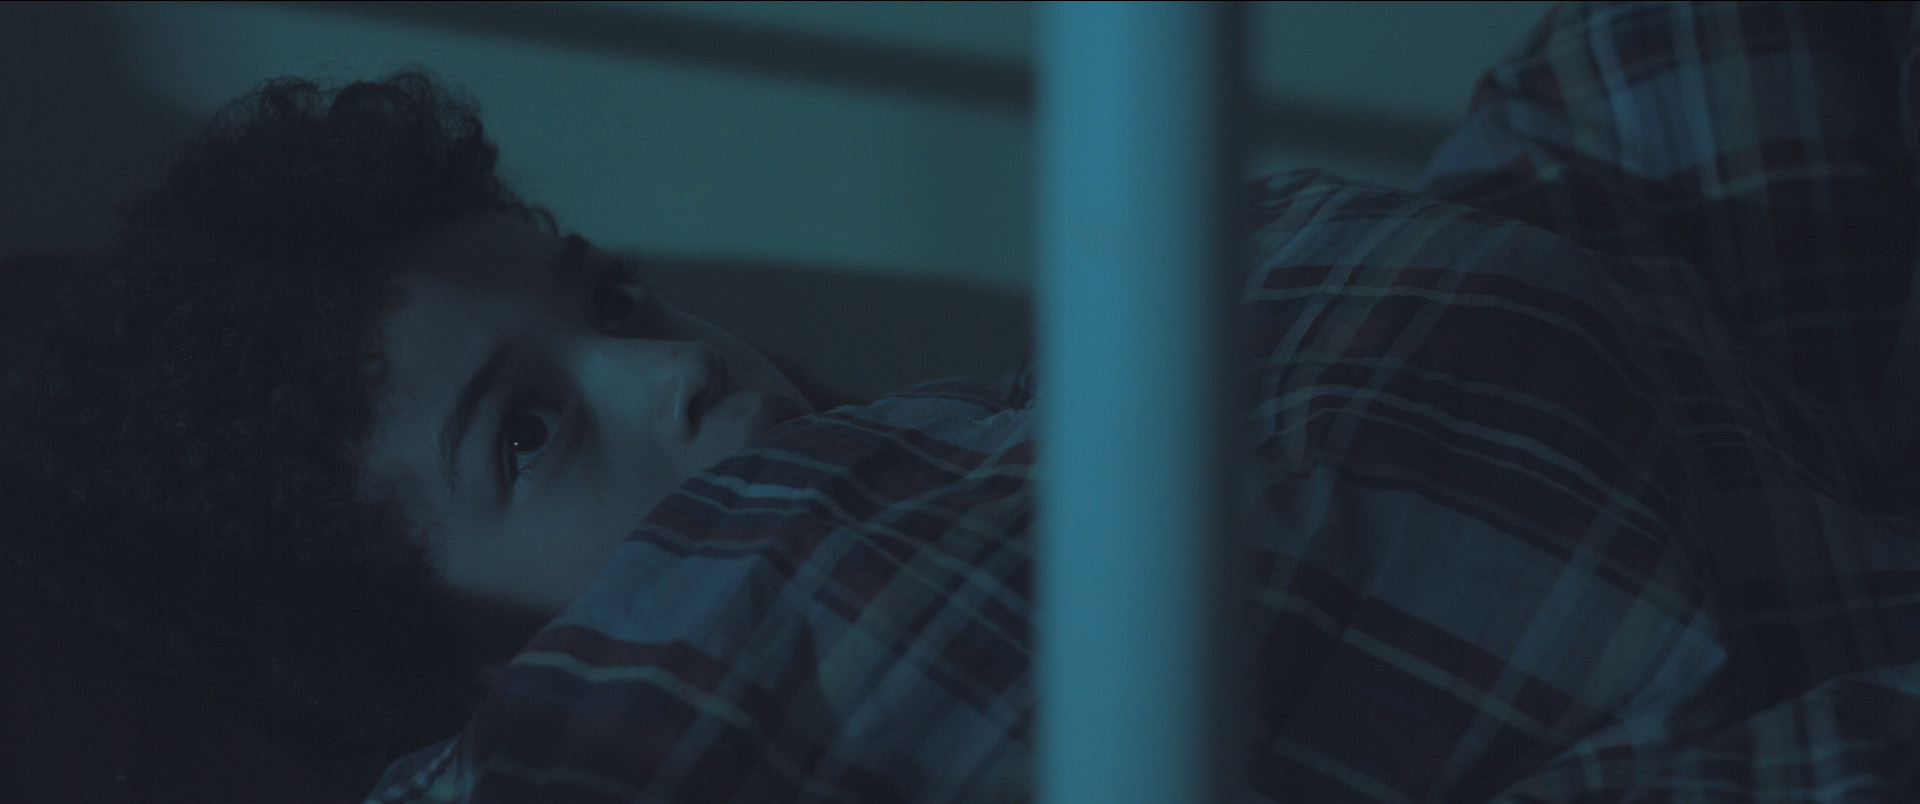 Sleep Tight - Short Film